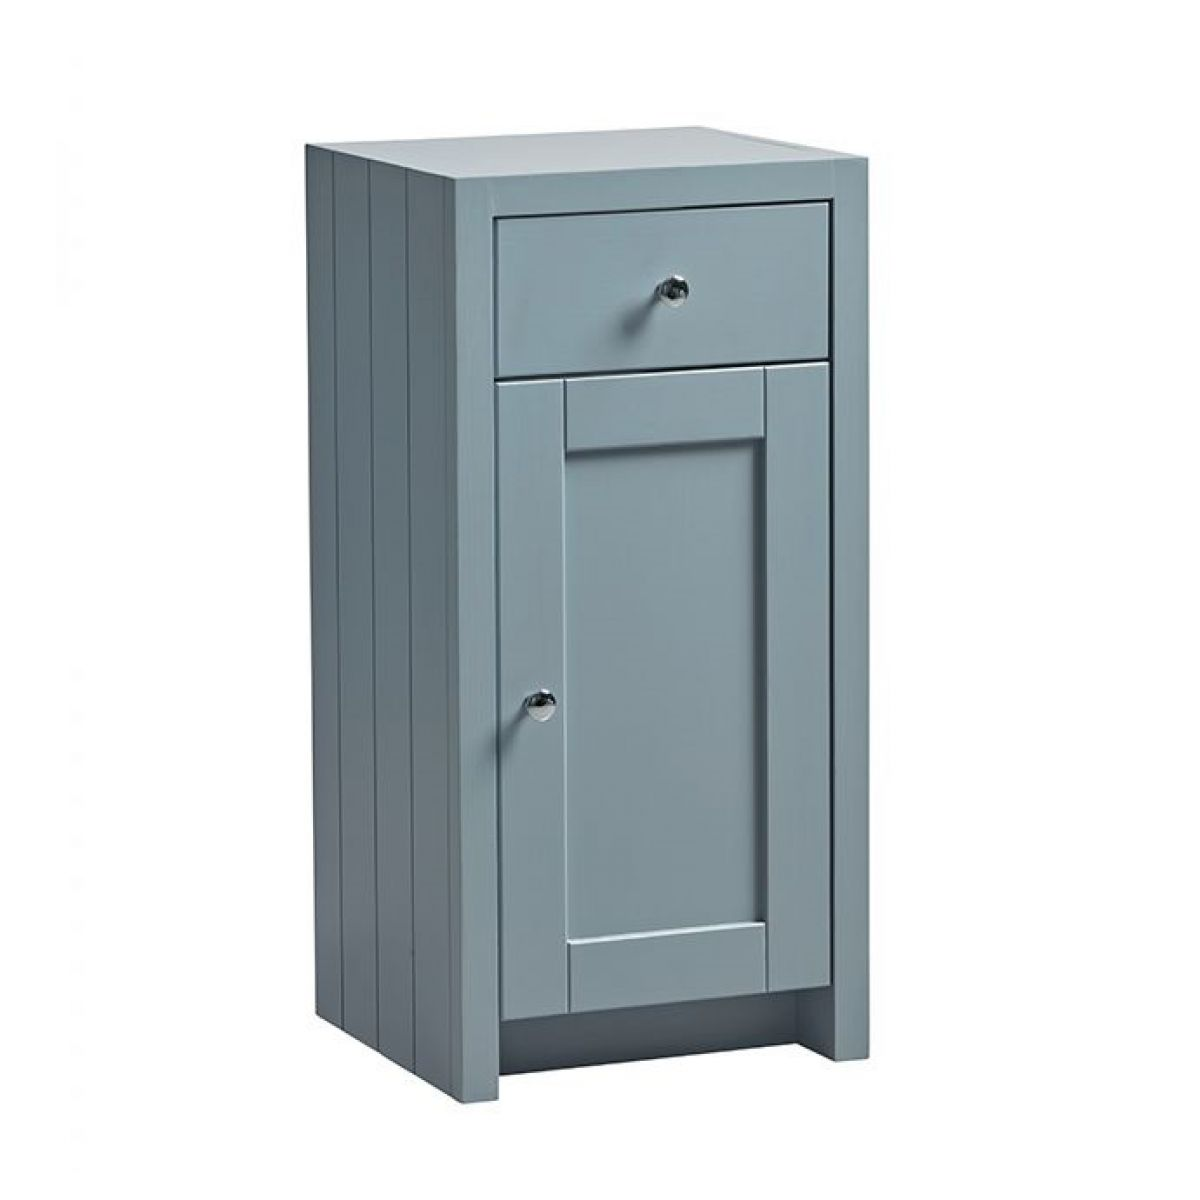 Tavistock Lansdown Bathroom Storage Cupboard